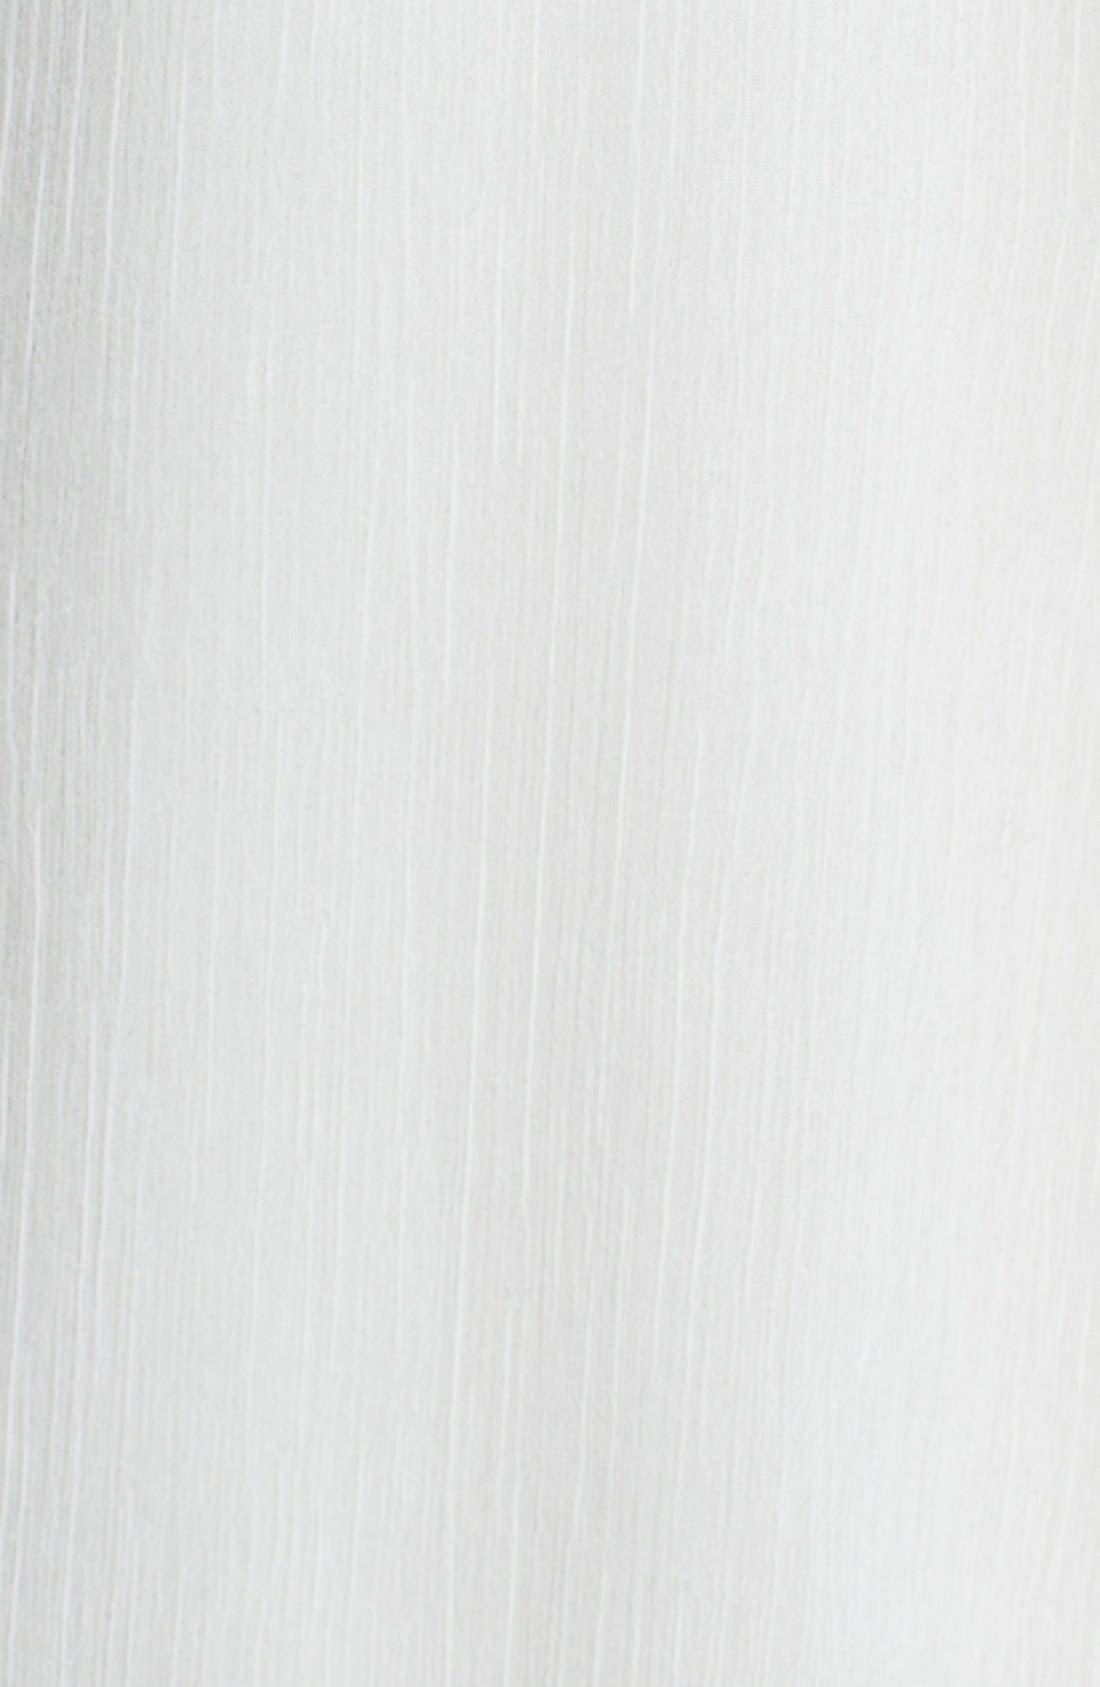 Alternate Image 3  - ECI Embroidered Crinkled Chiffon Blouse